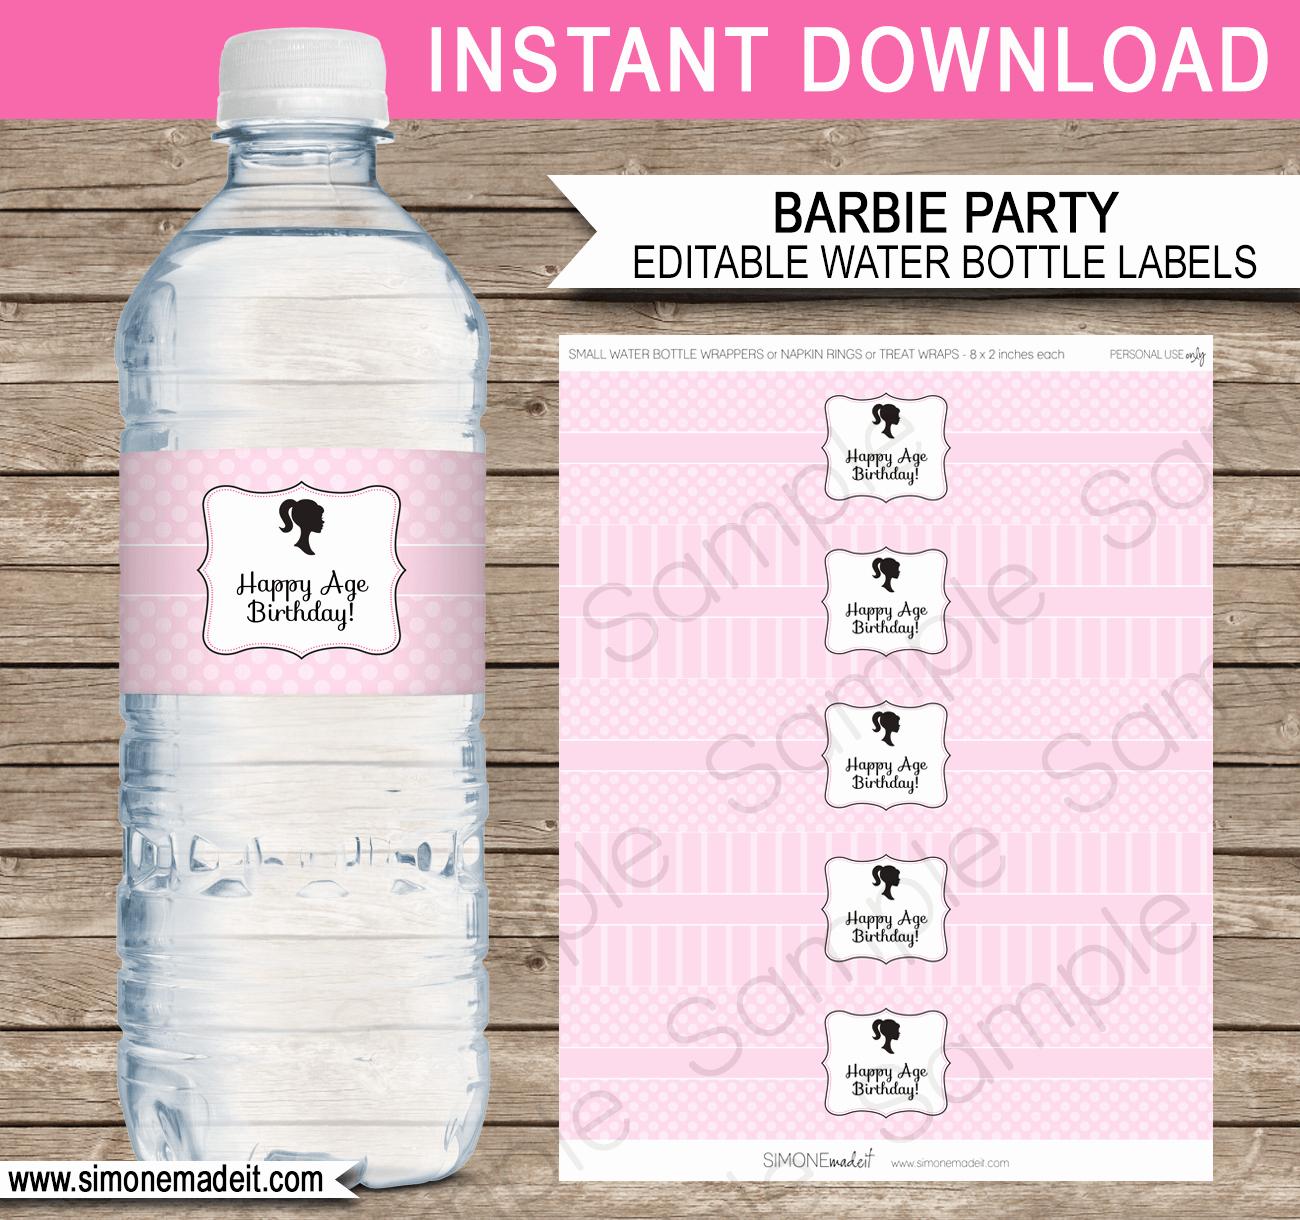 Free Water Bottle Template Unique Barbie Party Water Bottle Labels